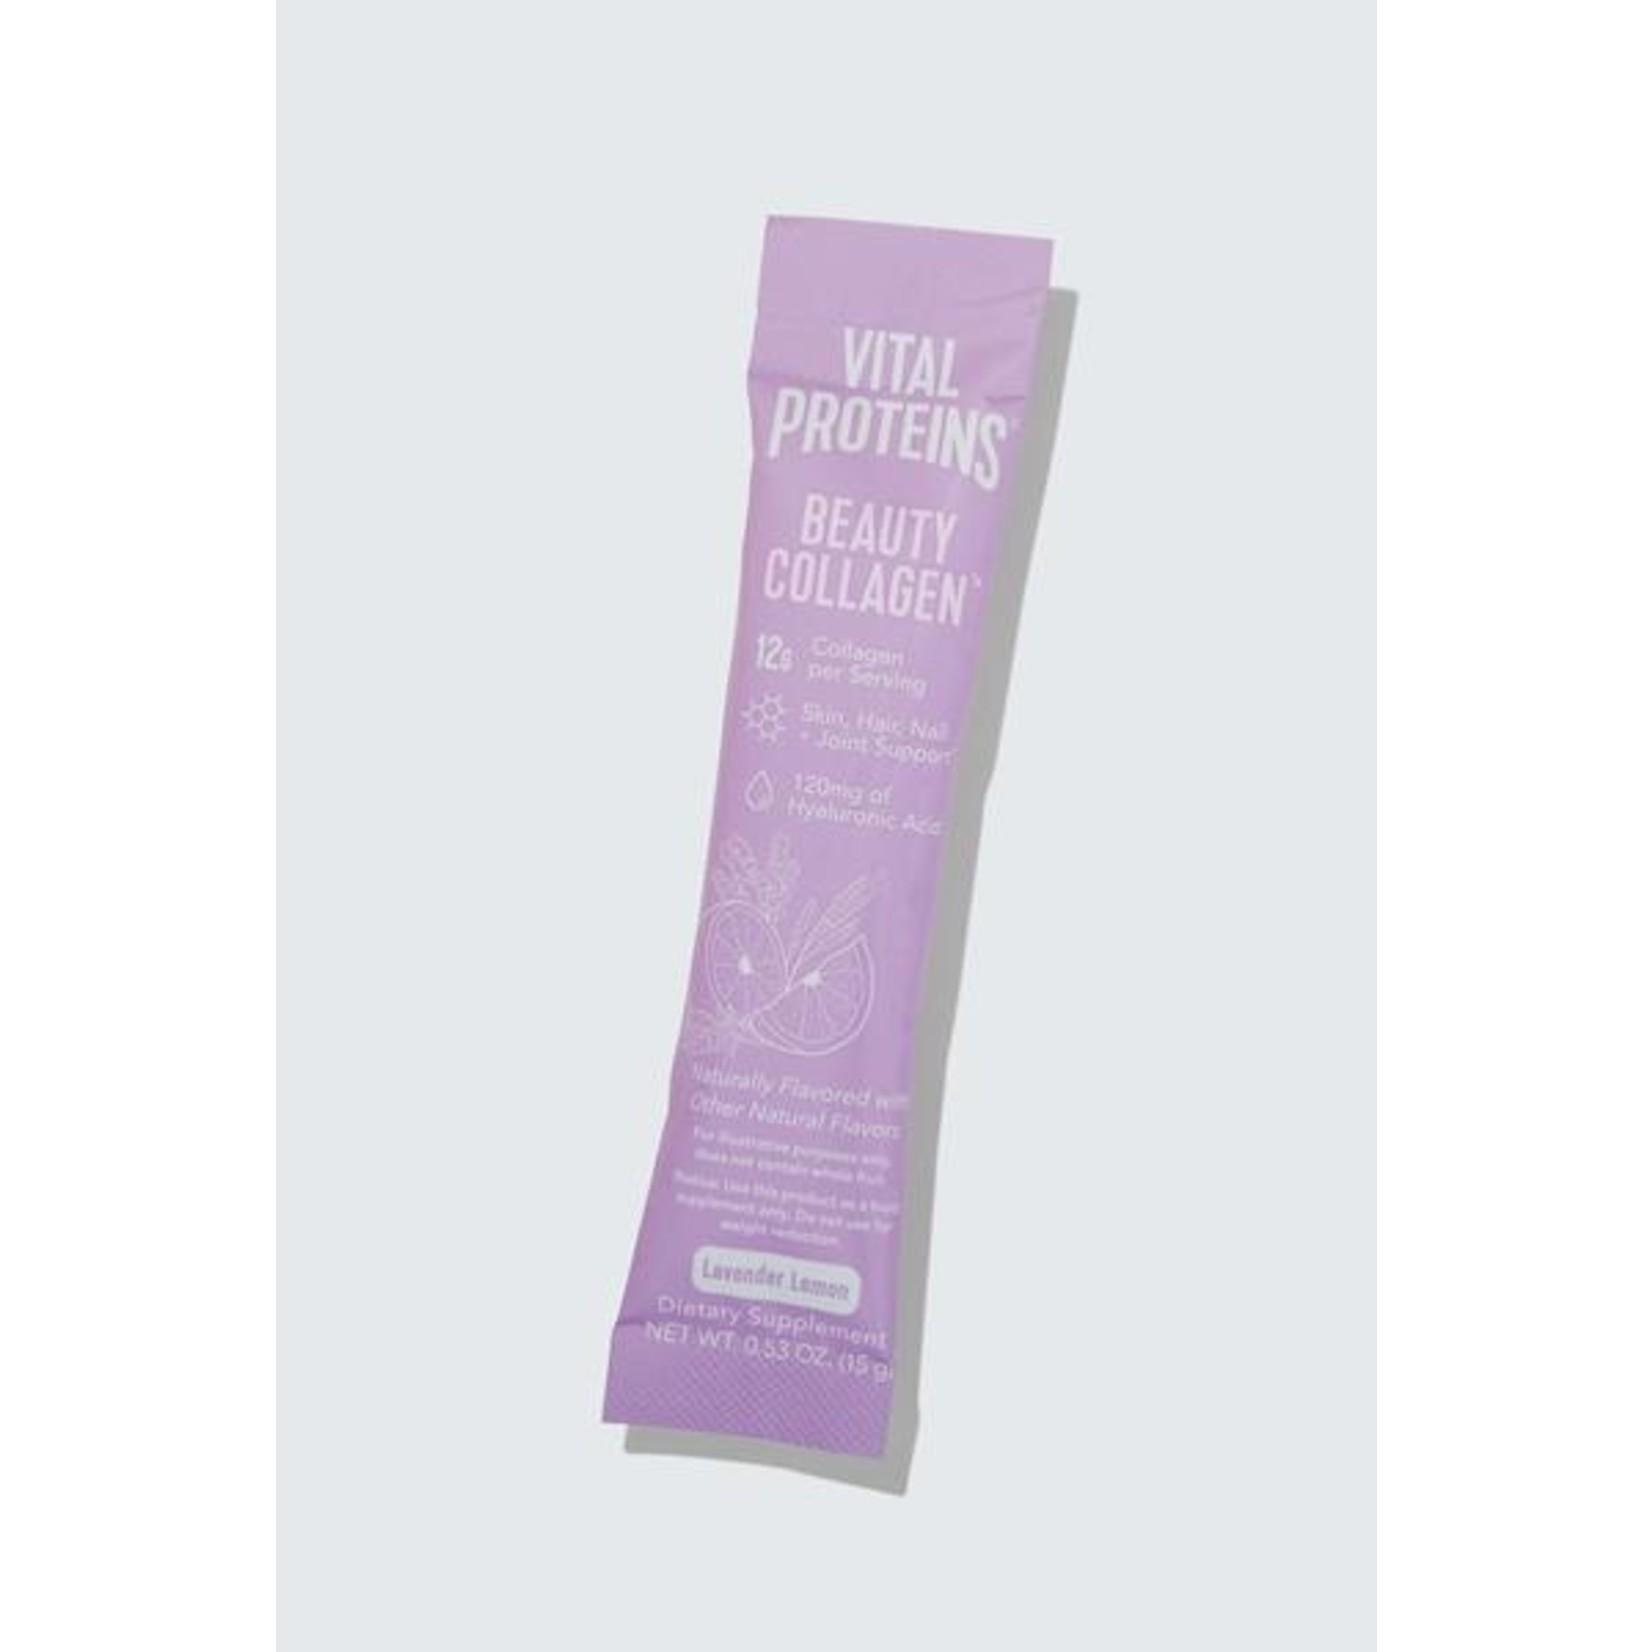 Vital Proteins Beauty Collagen Lavender Lemon- Single